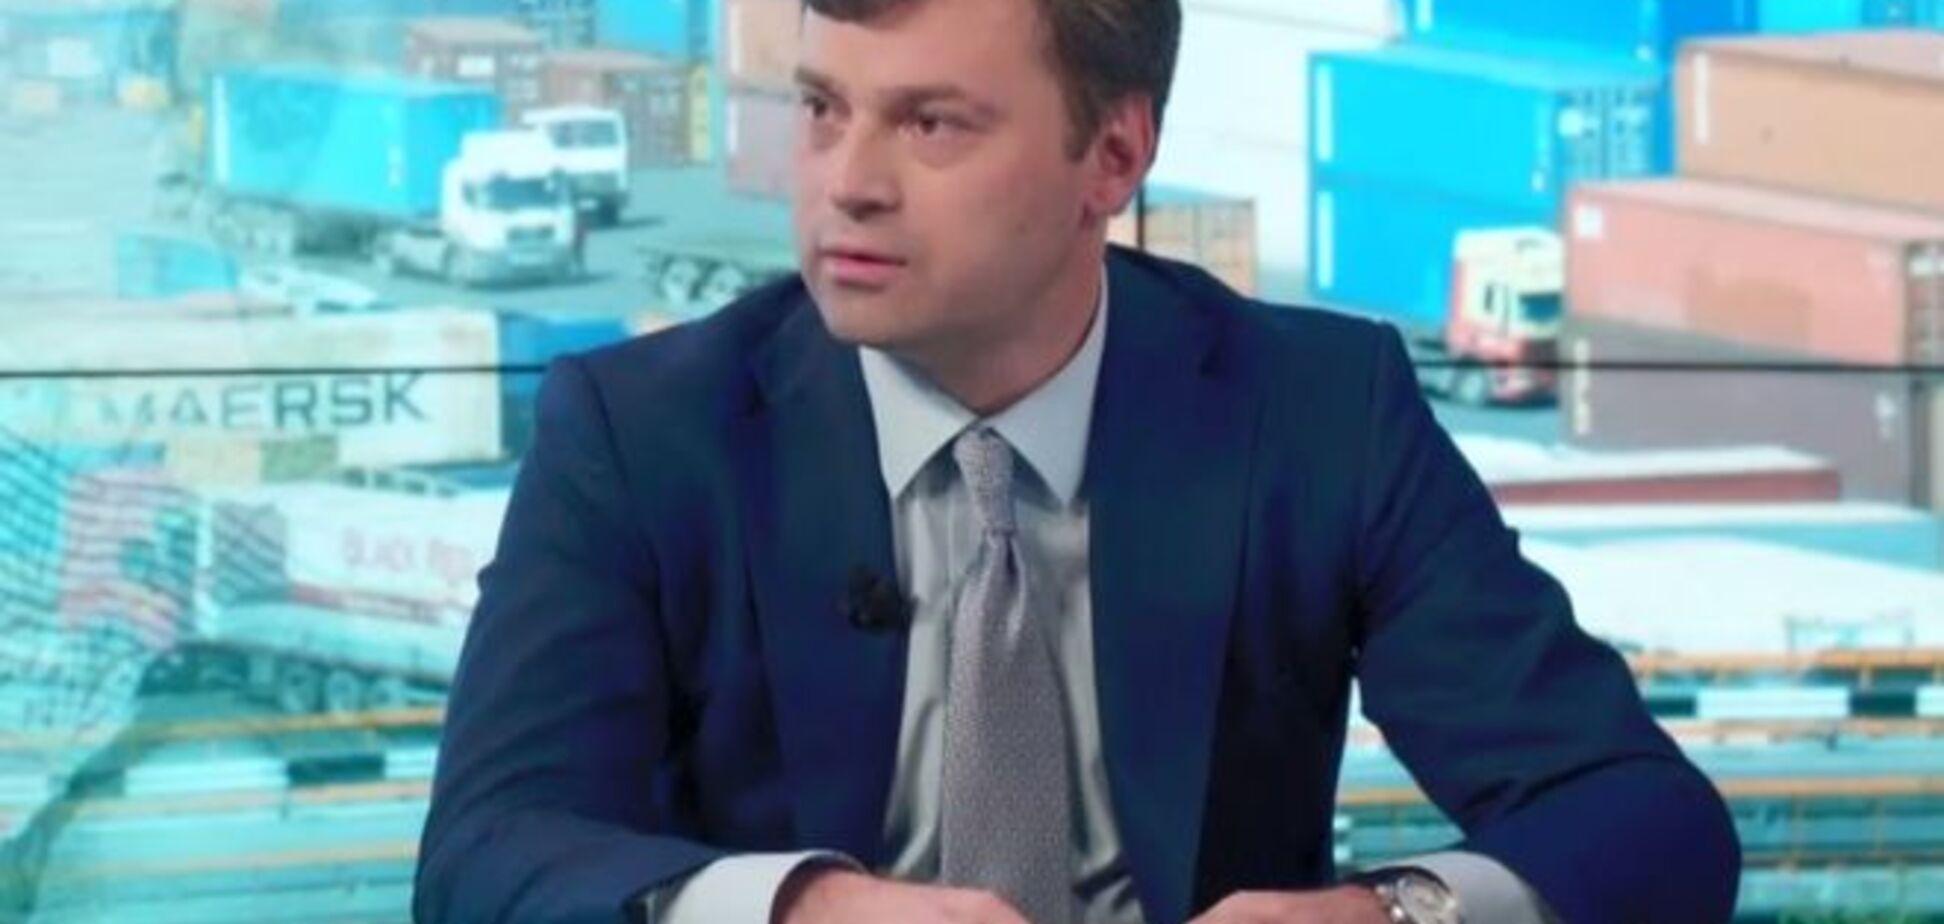 У ГФС взялися за 'БРСМ-Нафту': визначена сума збитку